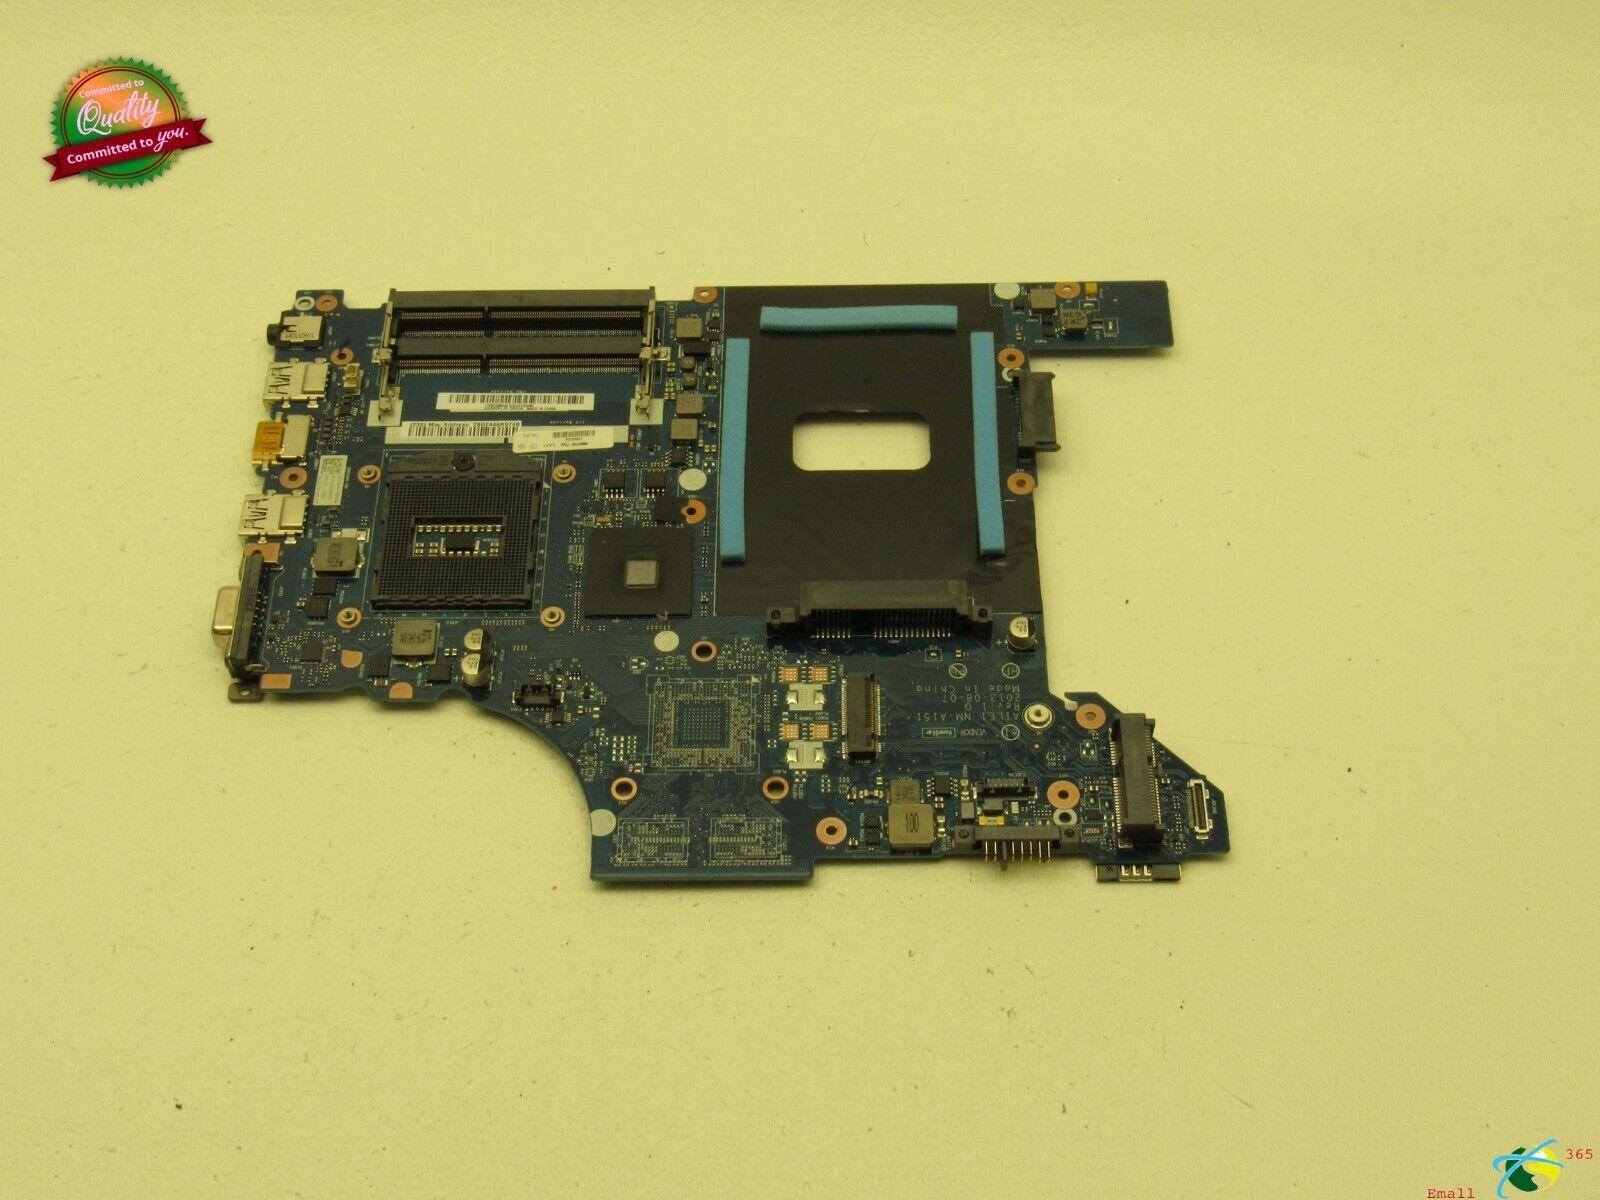 For Lenovo E440 AILE1 NM-A151 Motherboard 04X4790 rPGA947 DDR3 intel